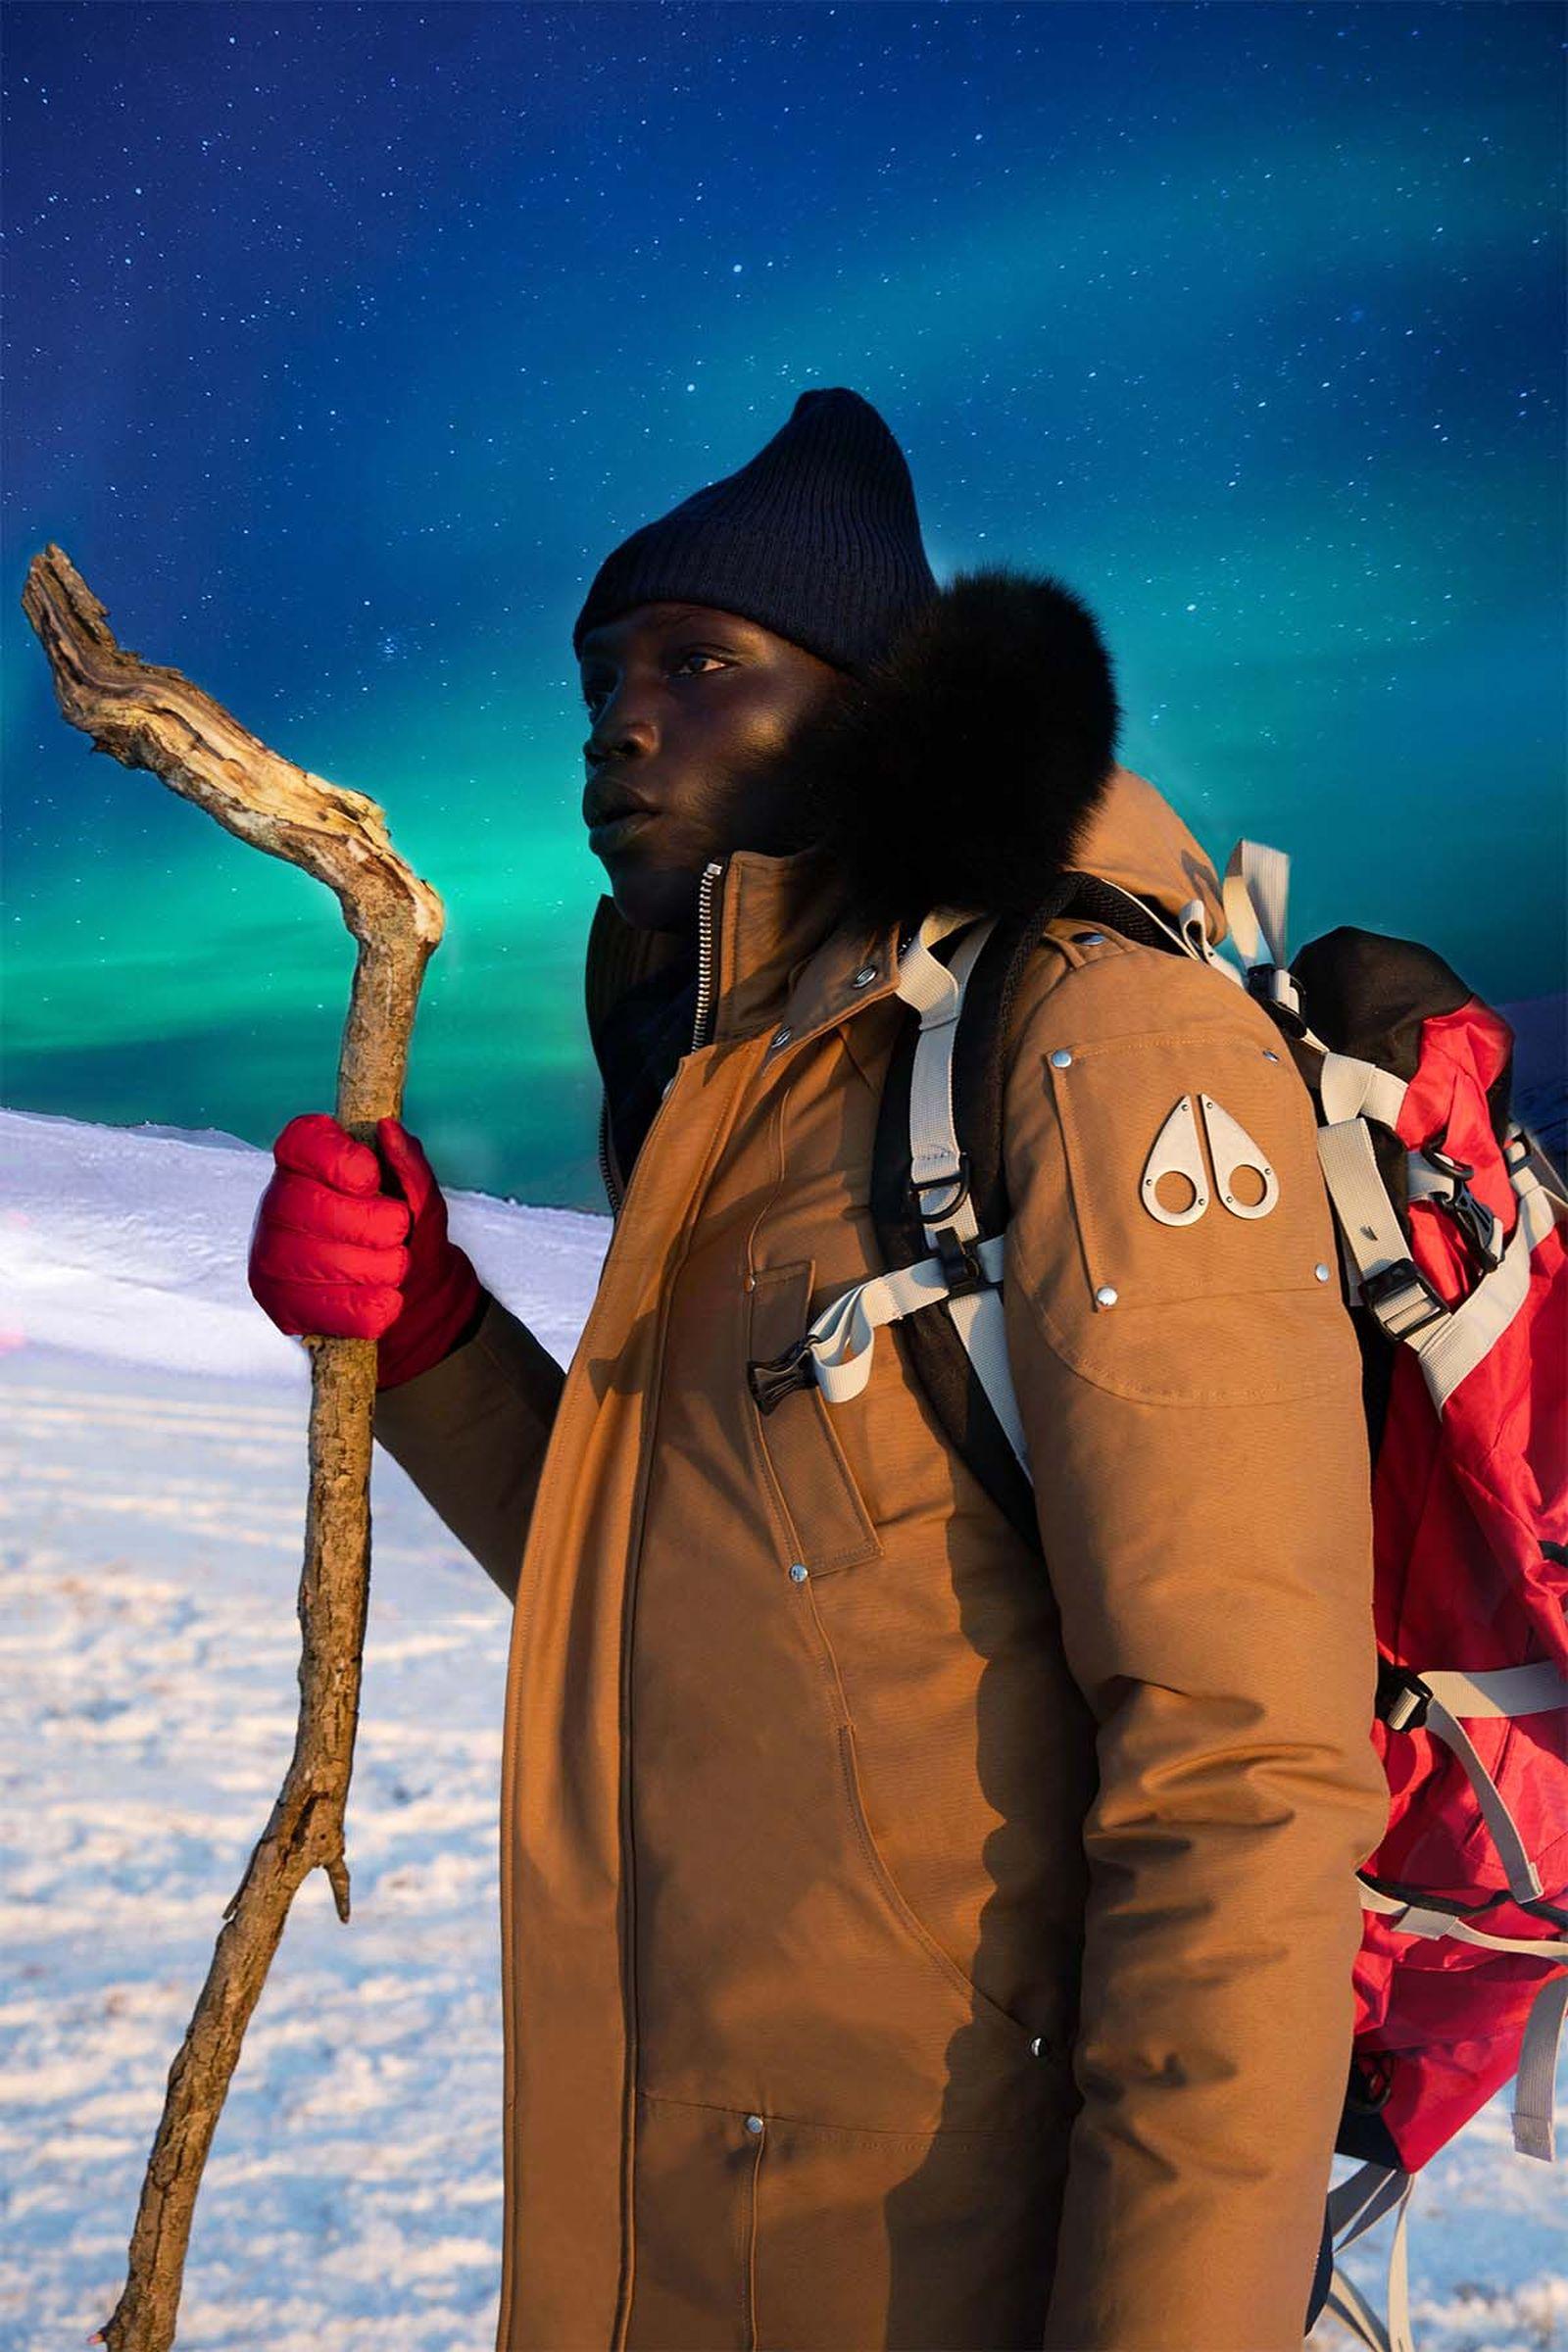 moose knuckles fw19 dennis rodman outerwear